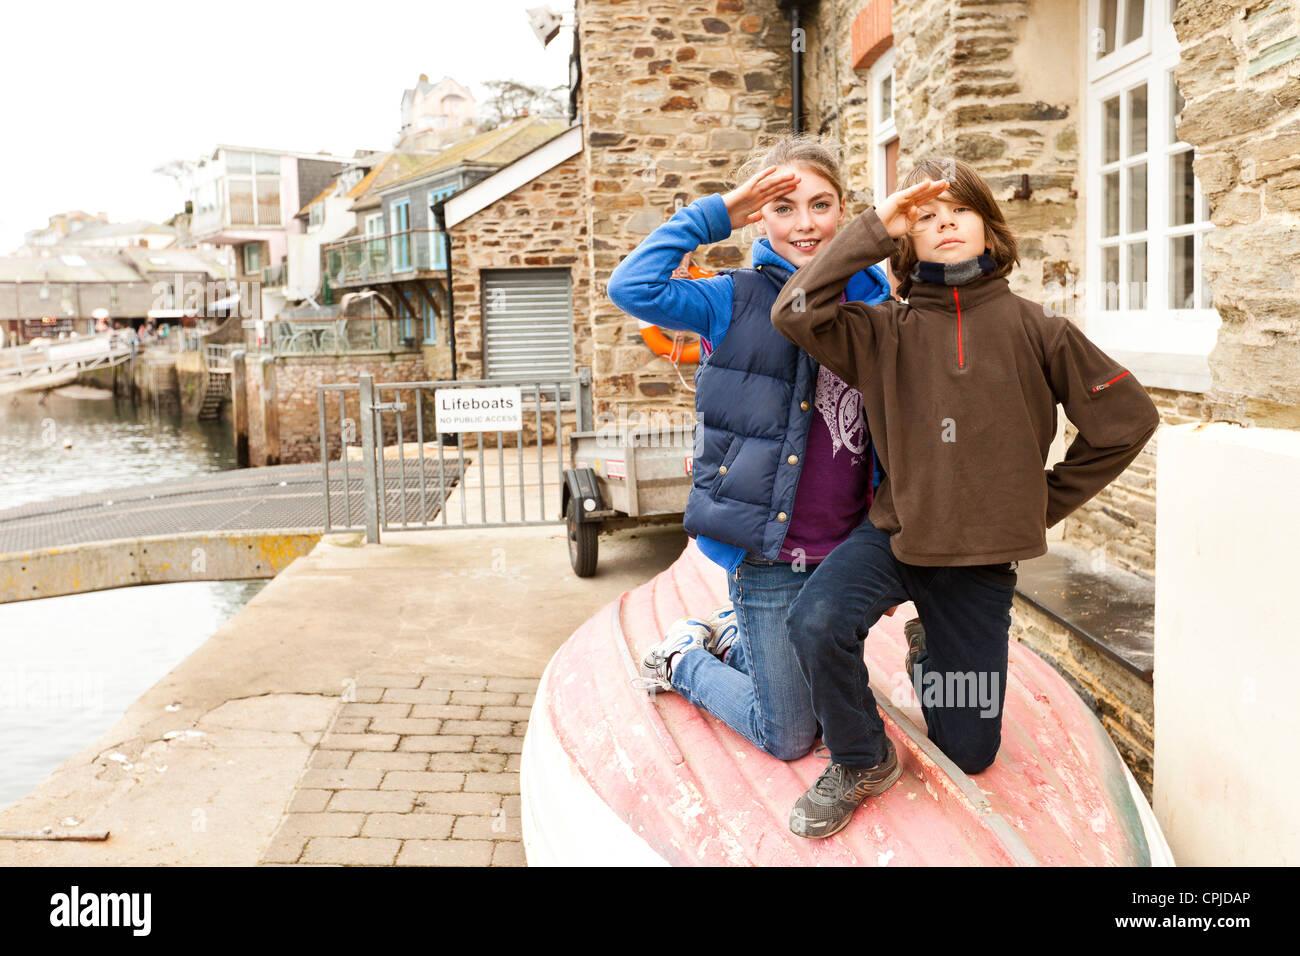 children sitting on boat - Stock Image